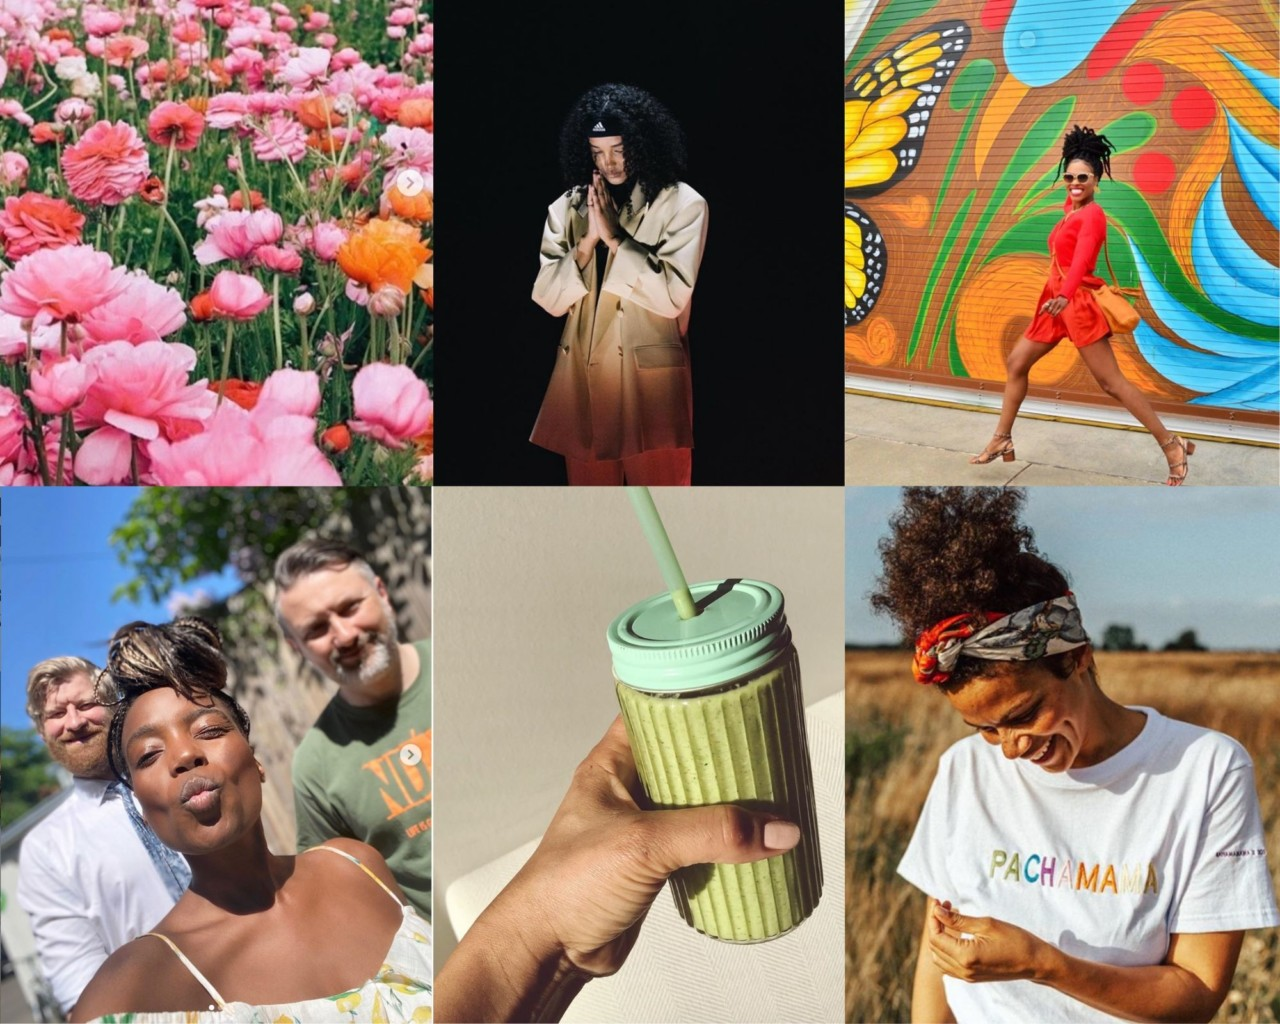 black-voices-matter-poc-inspirasjon-inspiration-melaninrik-greenhouse-eco